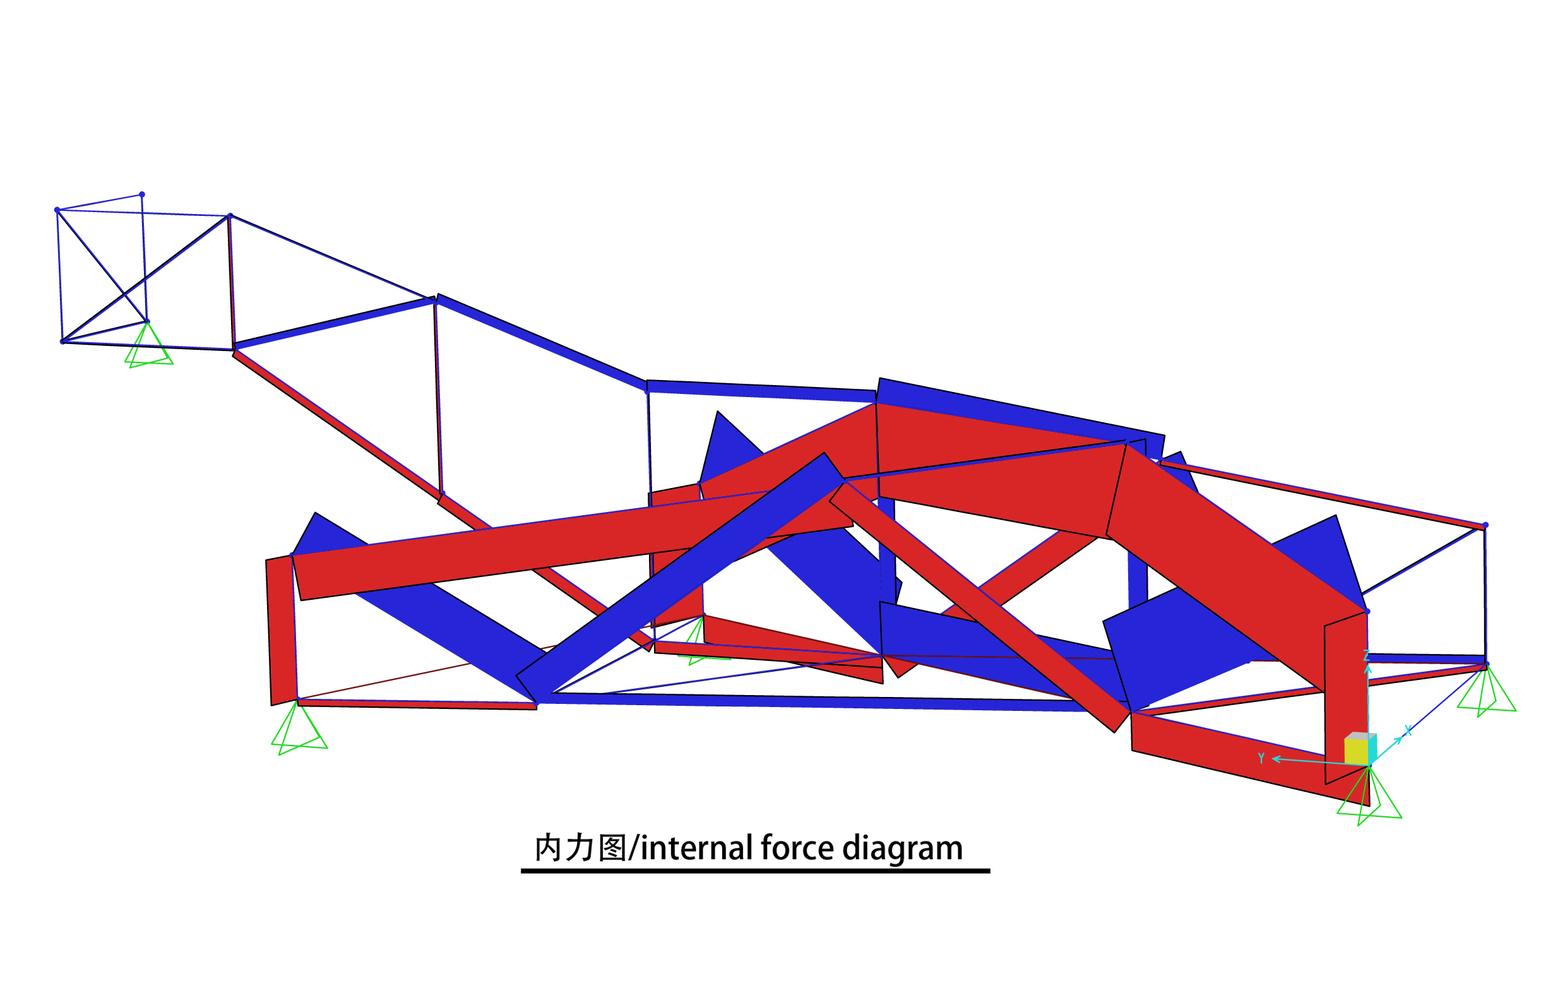 medium resolution of x bridge atelier groundwork architecture internal force diagram